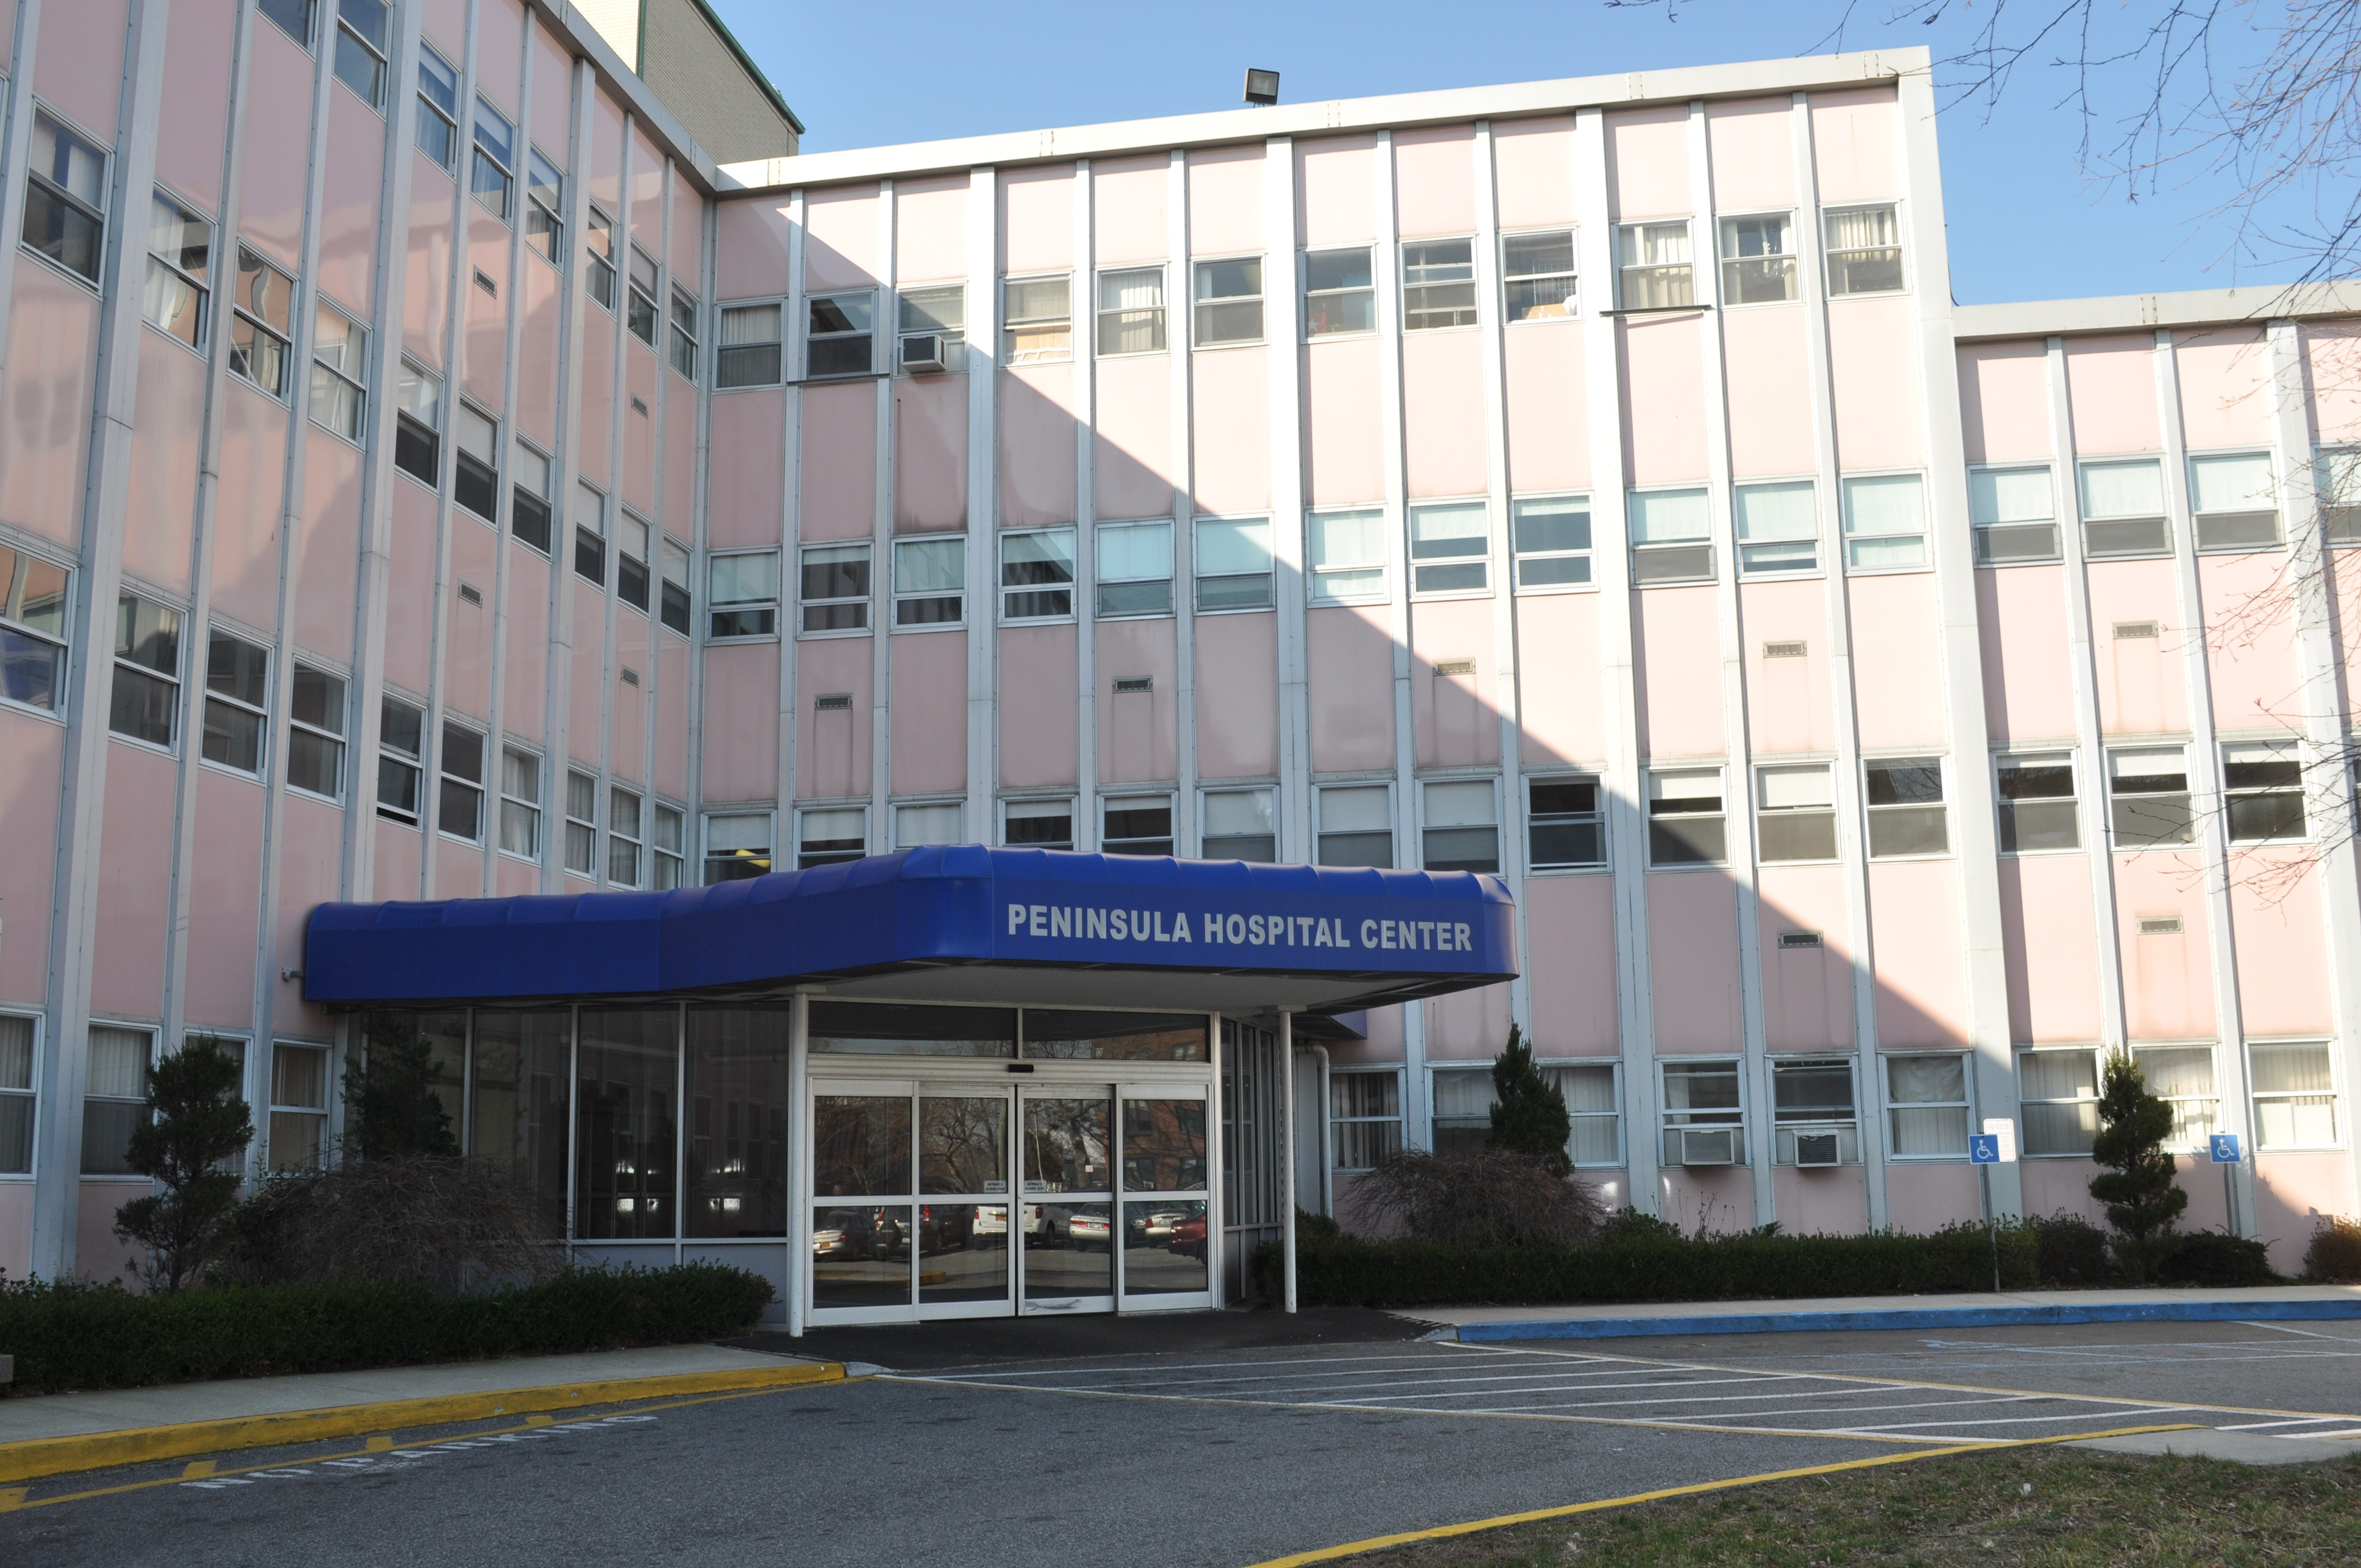 Peninsula Hospital Center